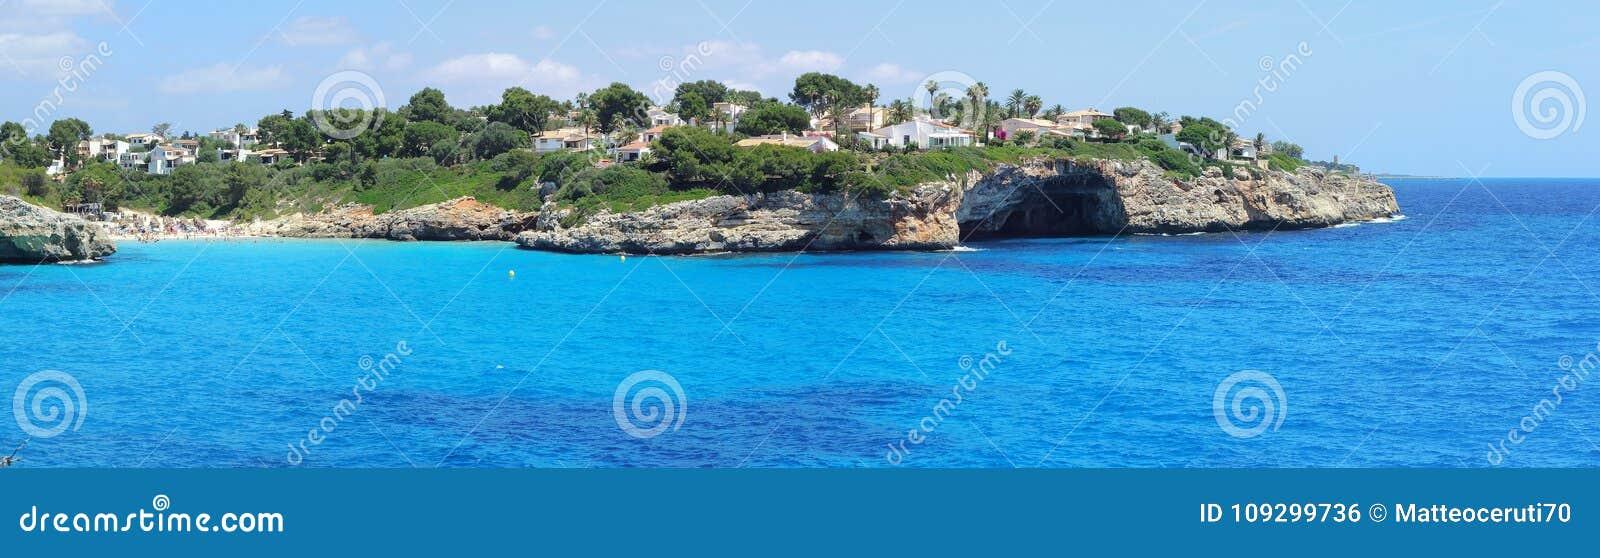 Landscape of the beautiful bay of Cala Anguila with a wonderful turquoise sea, Porto Cristo, Majorca, Spain